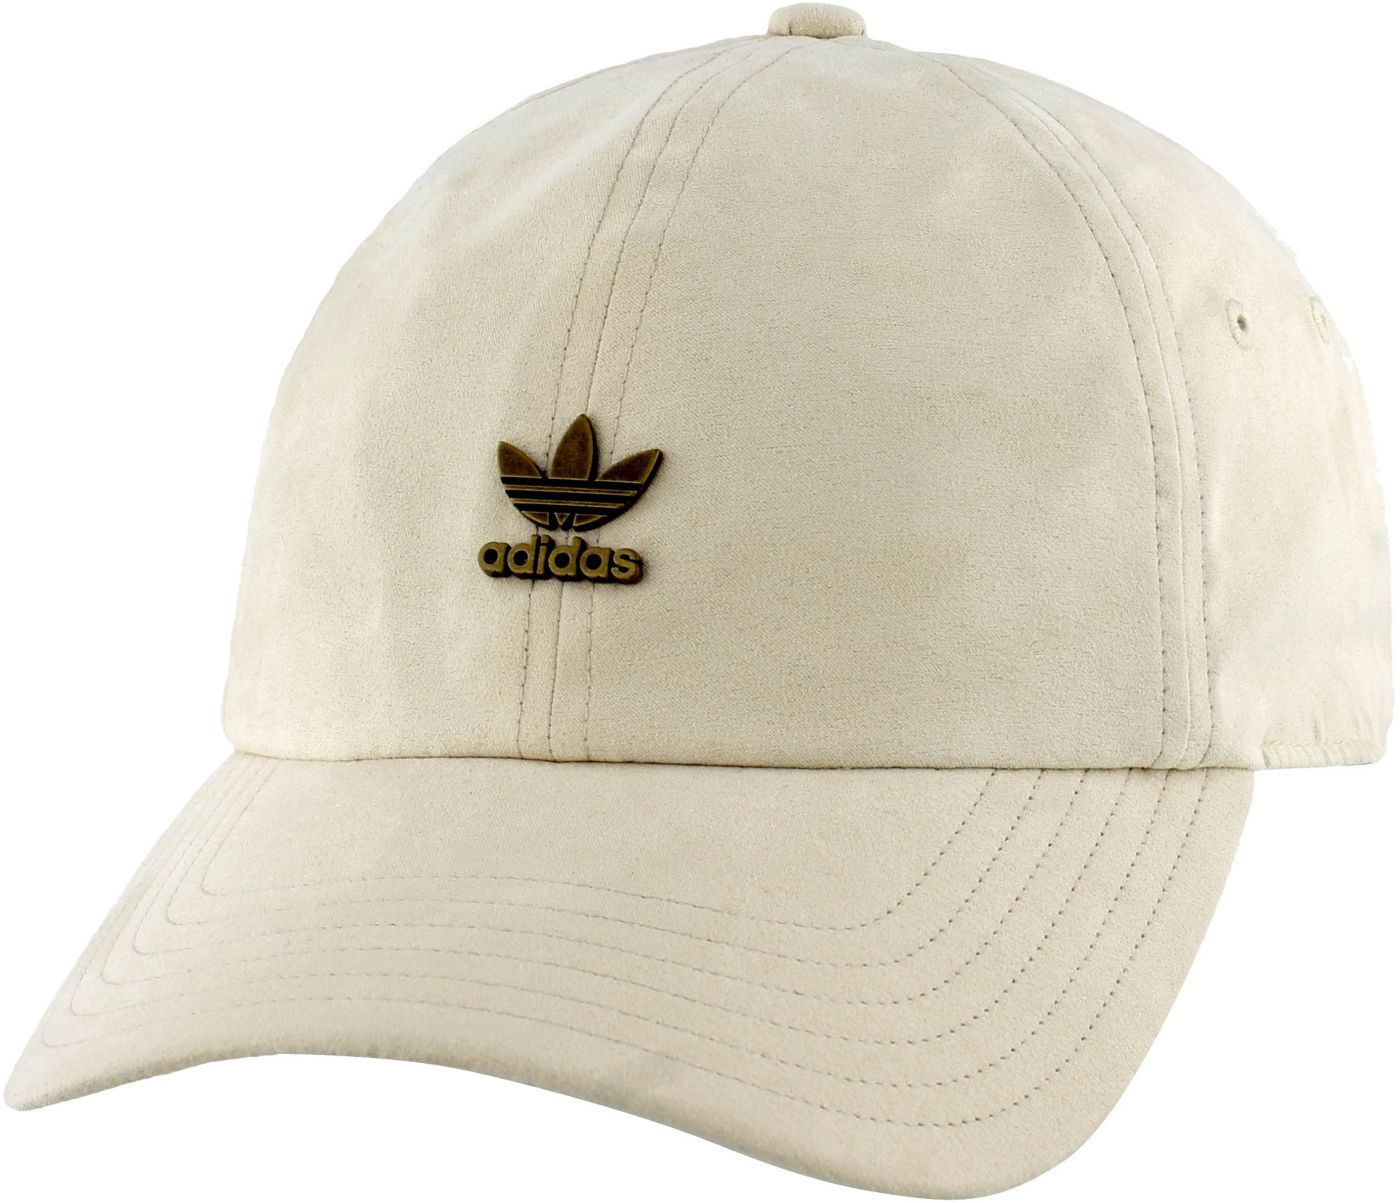 adidas Originals Men's Relaxed Metal Strapback Hat